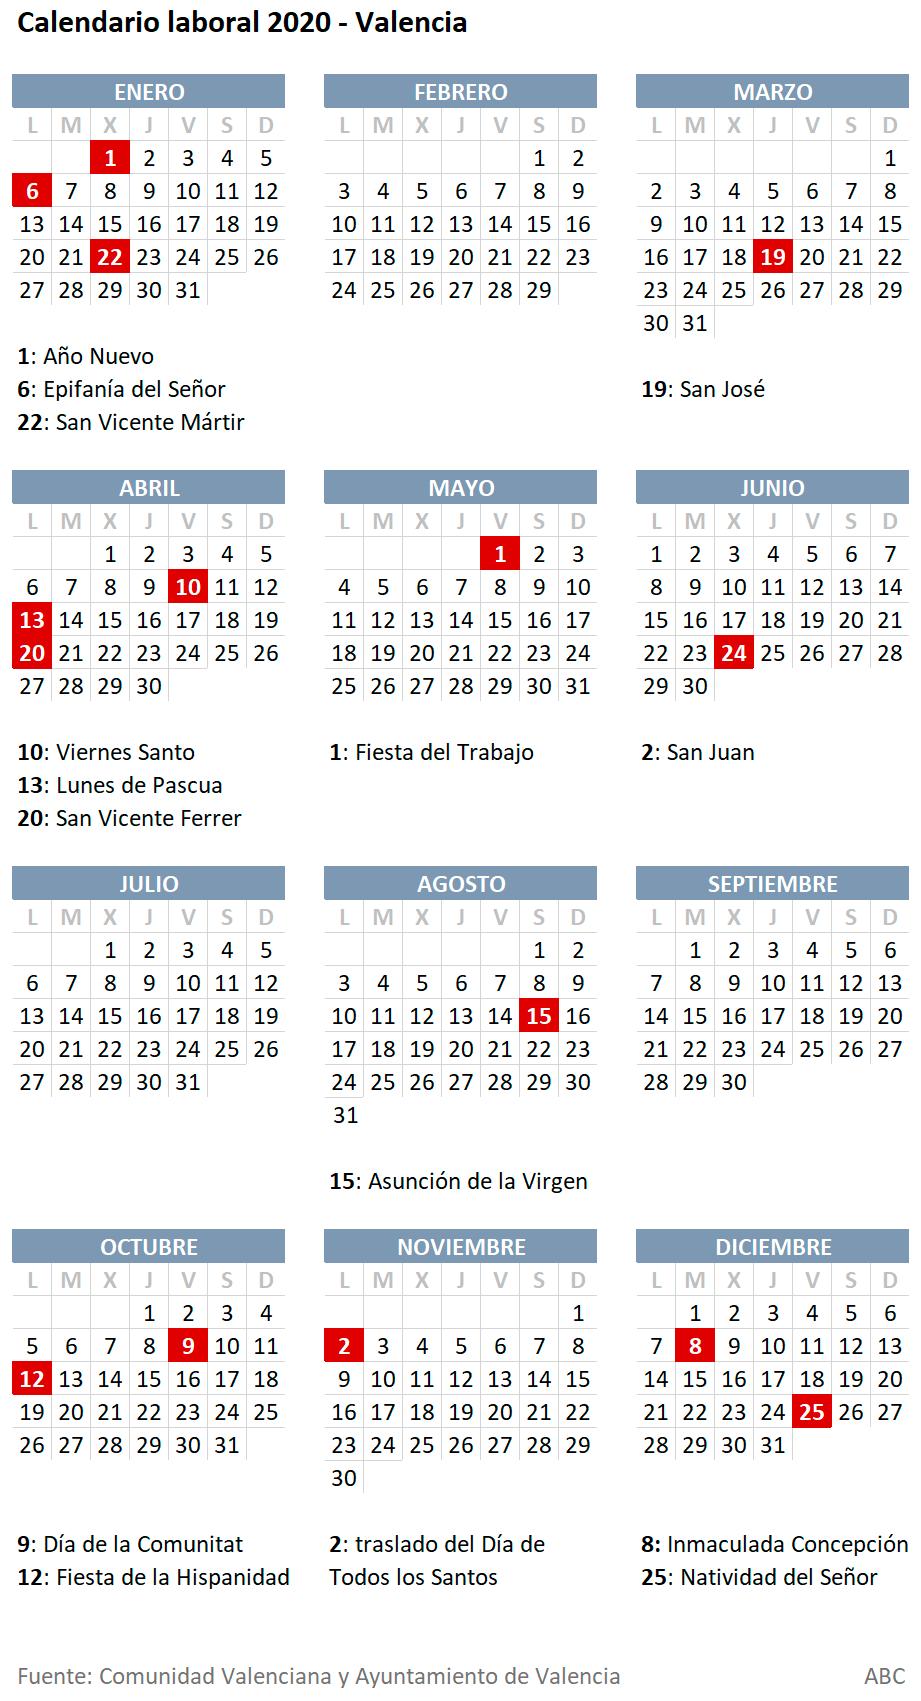 2020 Calendario Laboral.Calendario Laboral De Valencia 2020